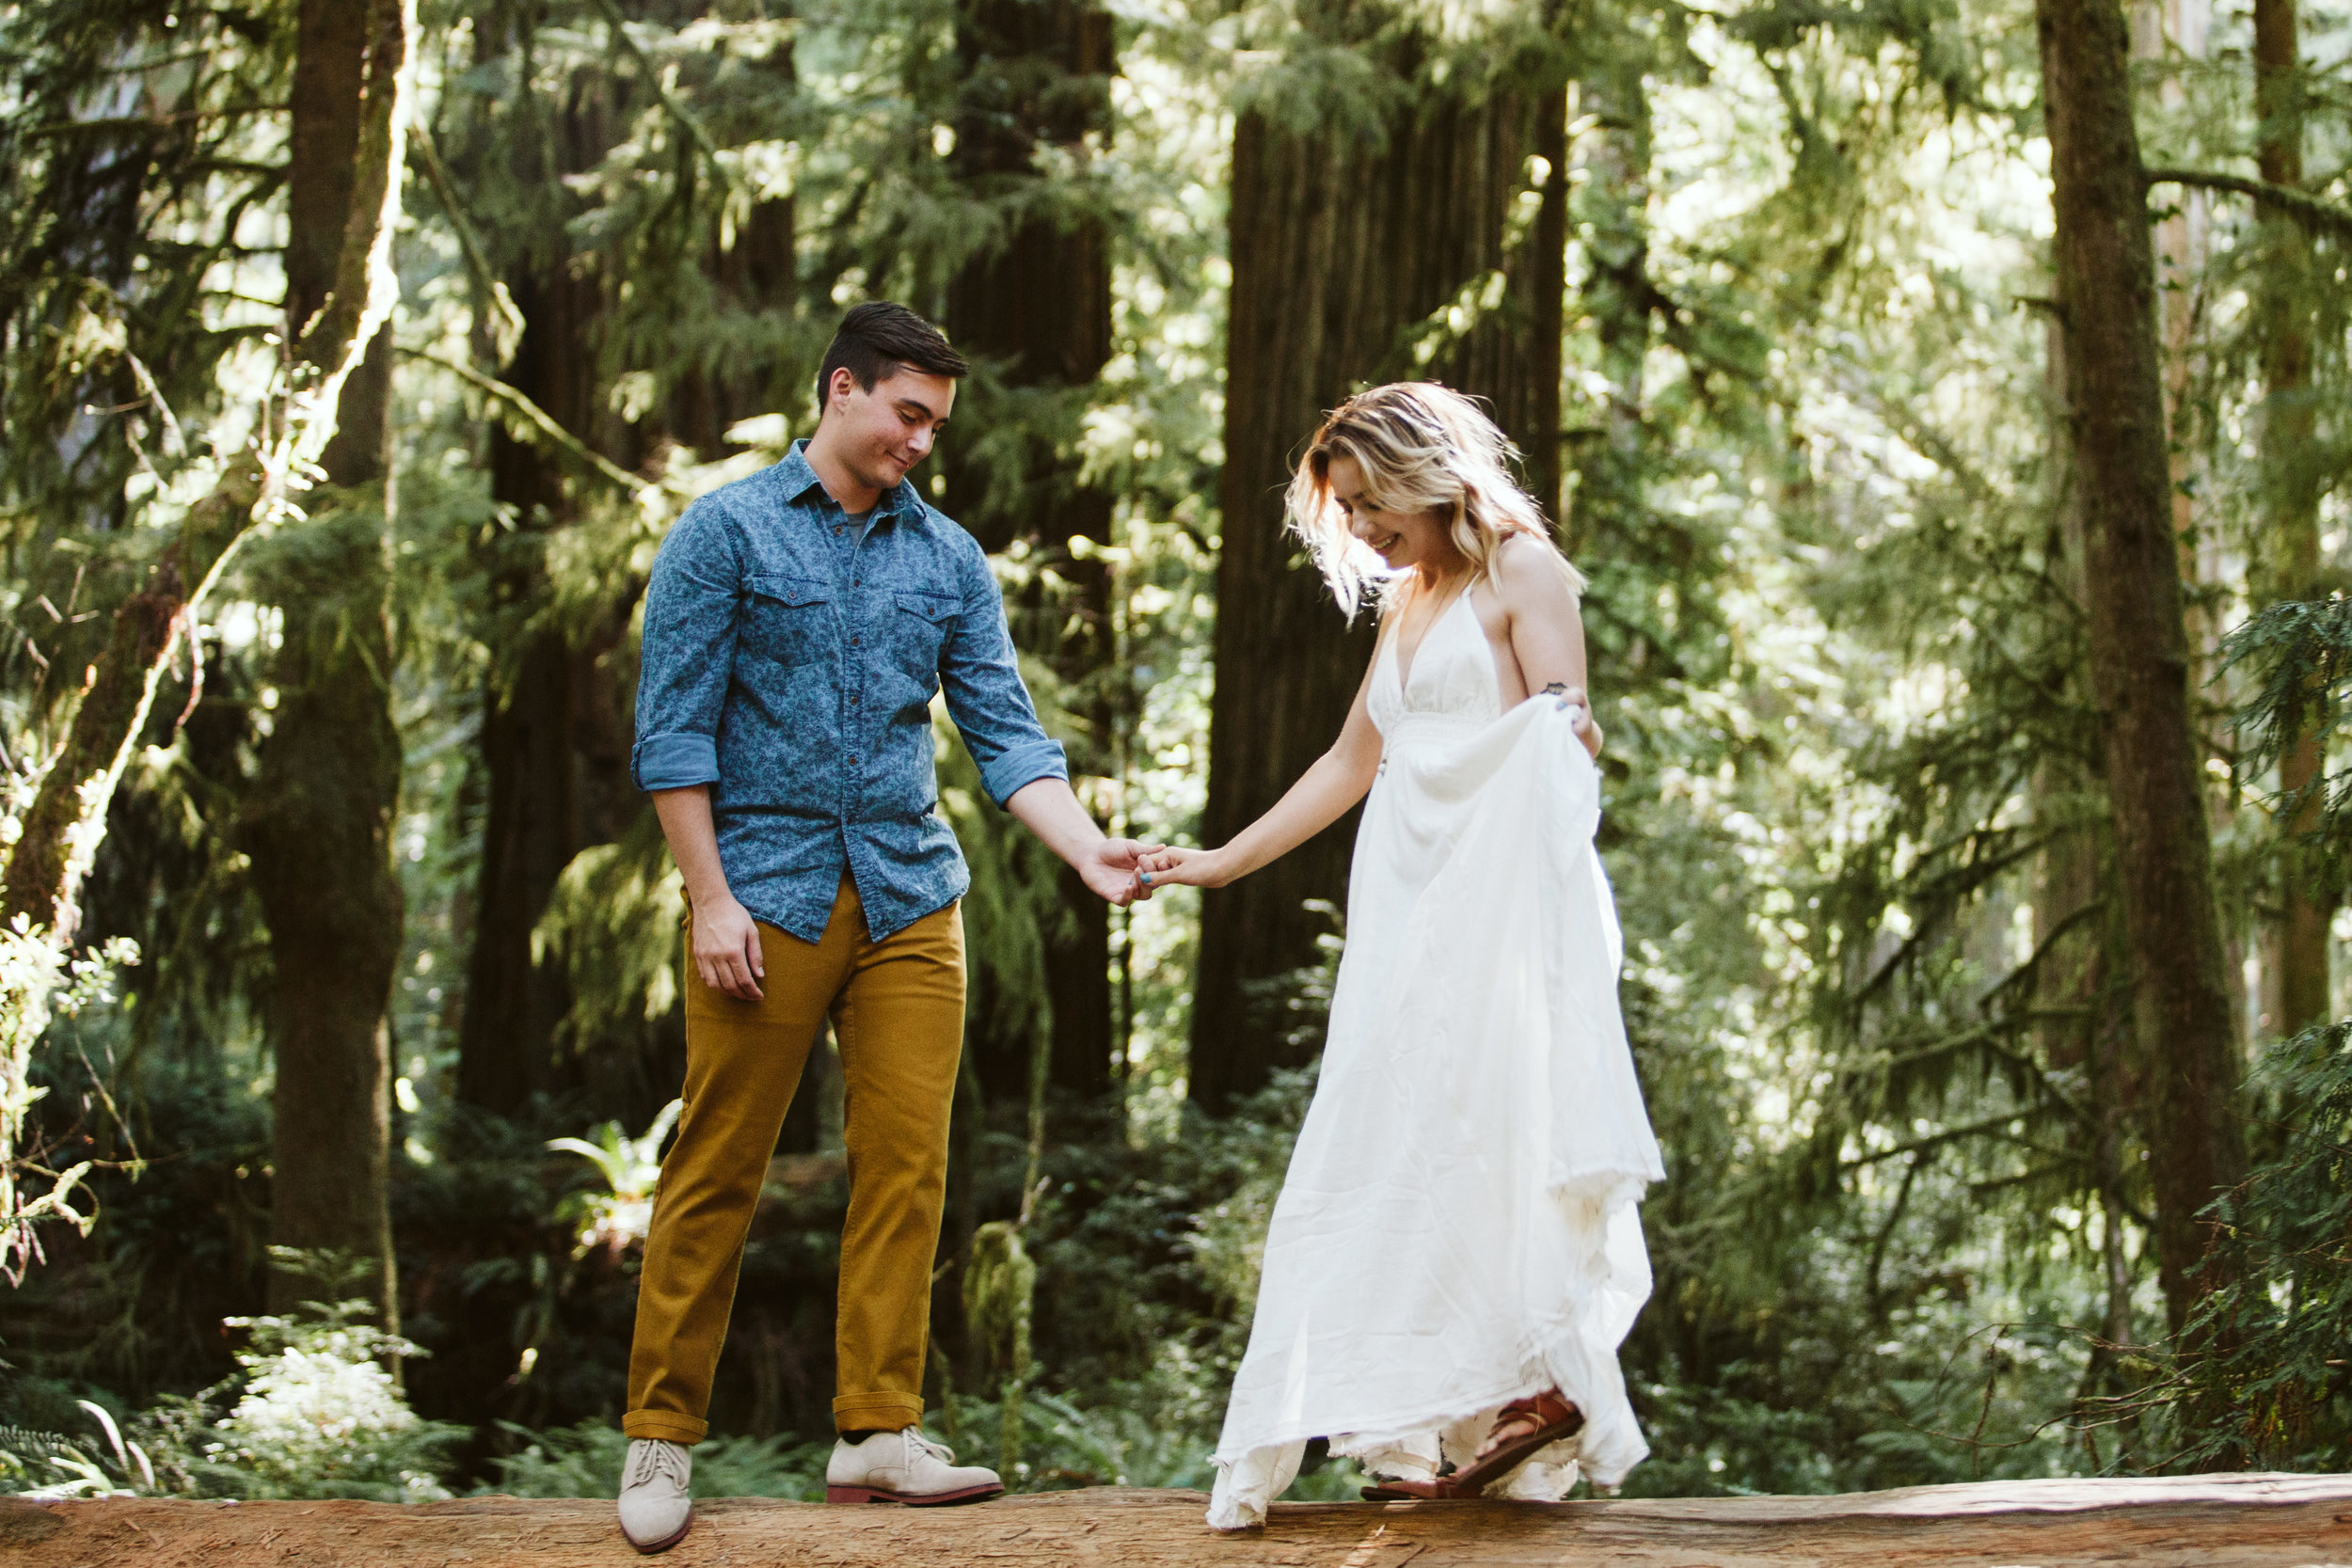 Hannah&Ben_Redwoods_Elopement_Engagement_PNW_SouthernOregon_NorthernCalifornia_ (4 of 23).jpg